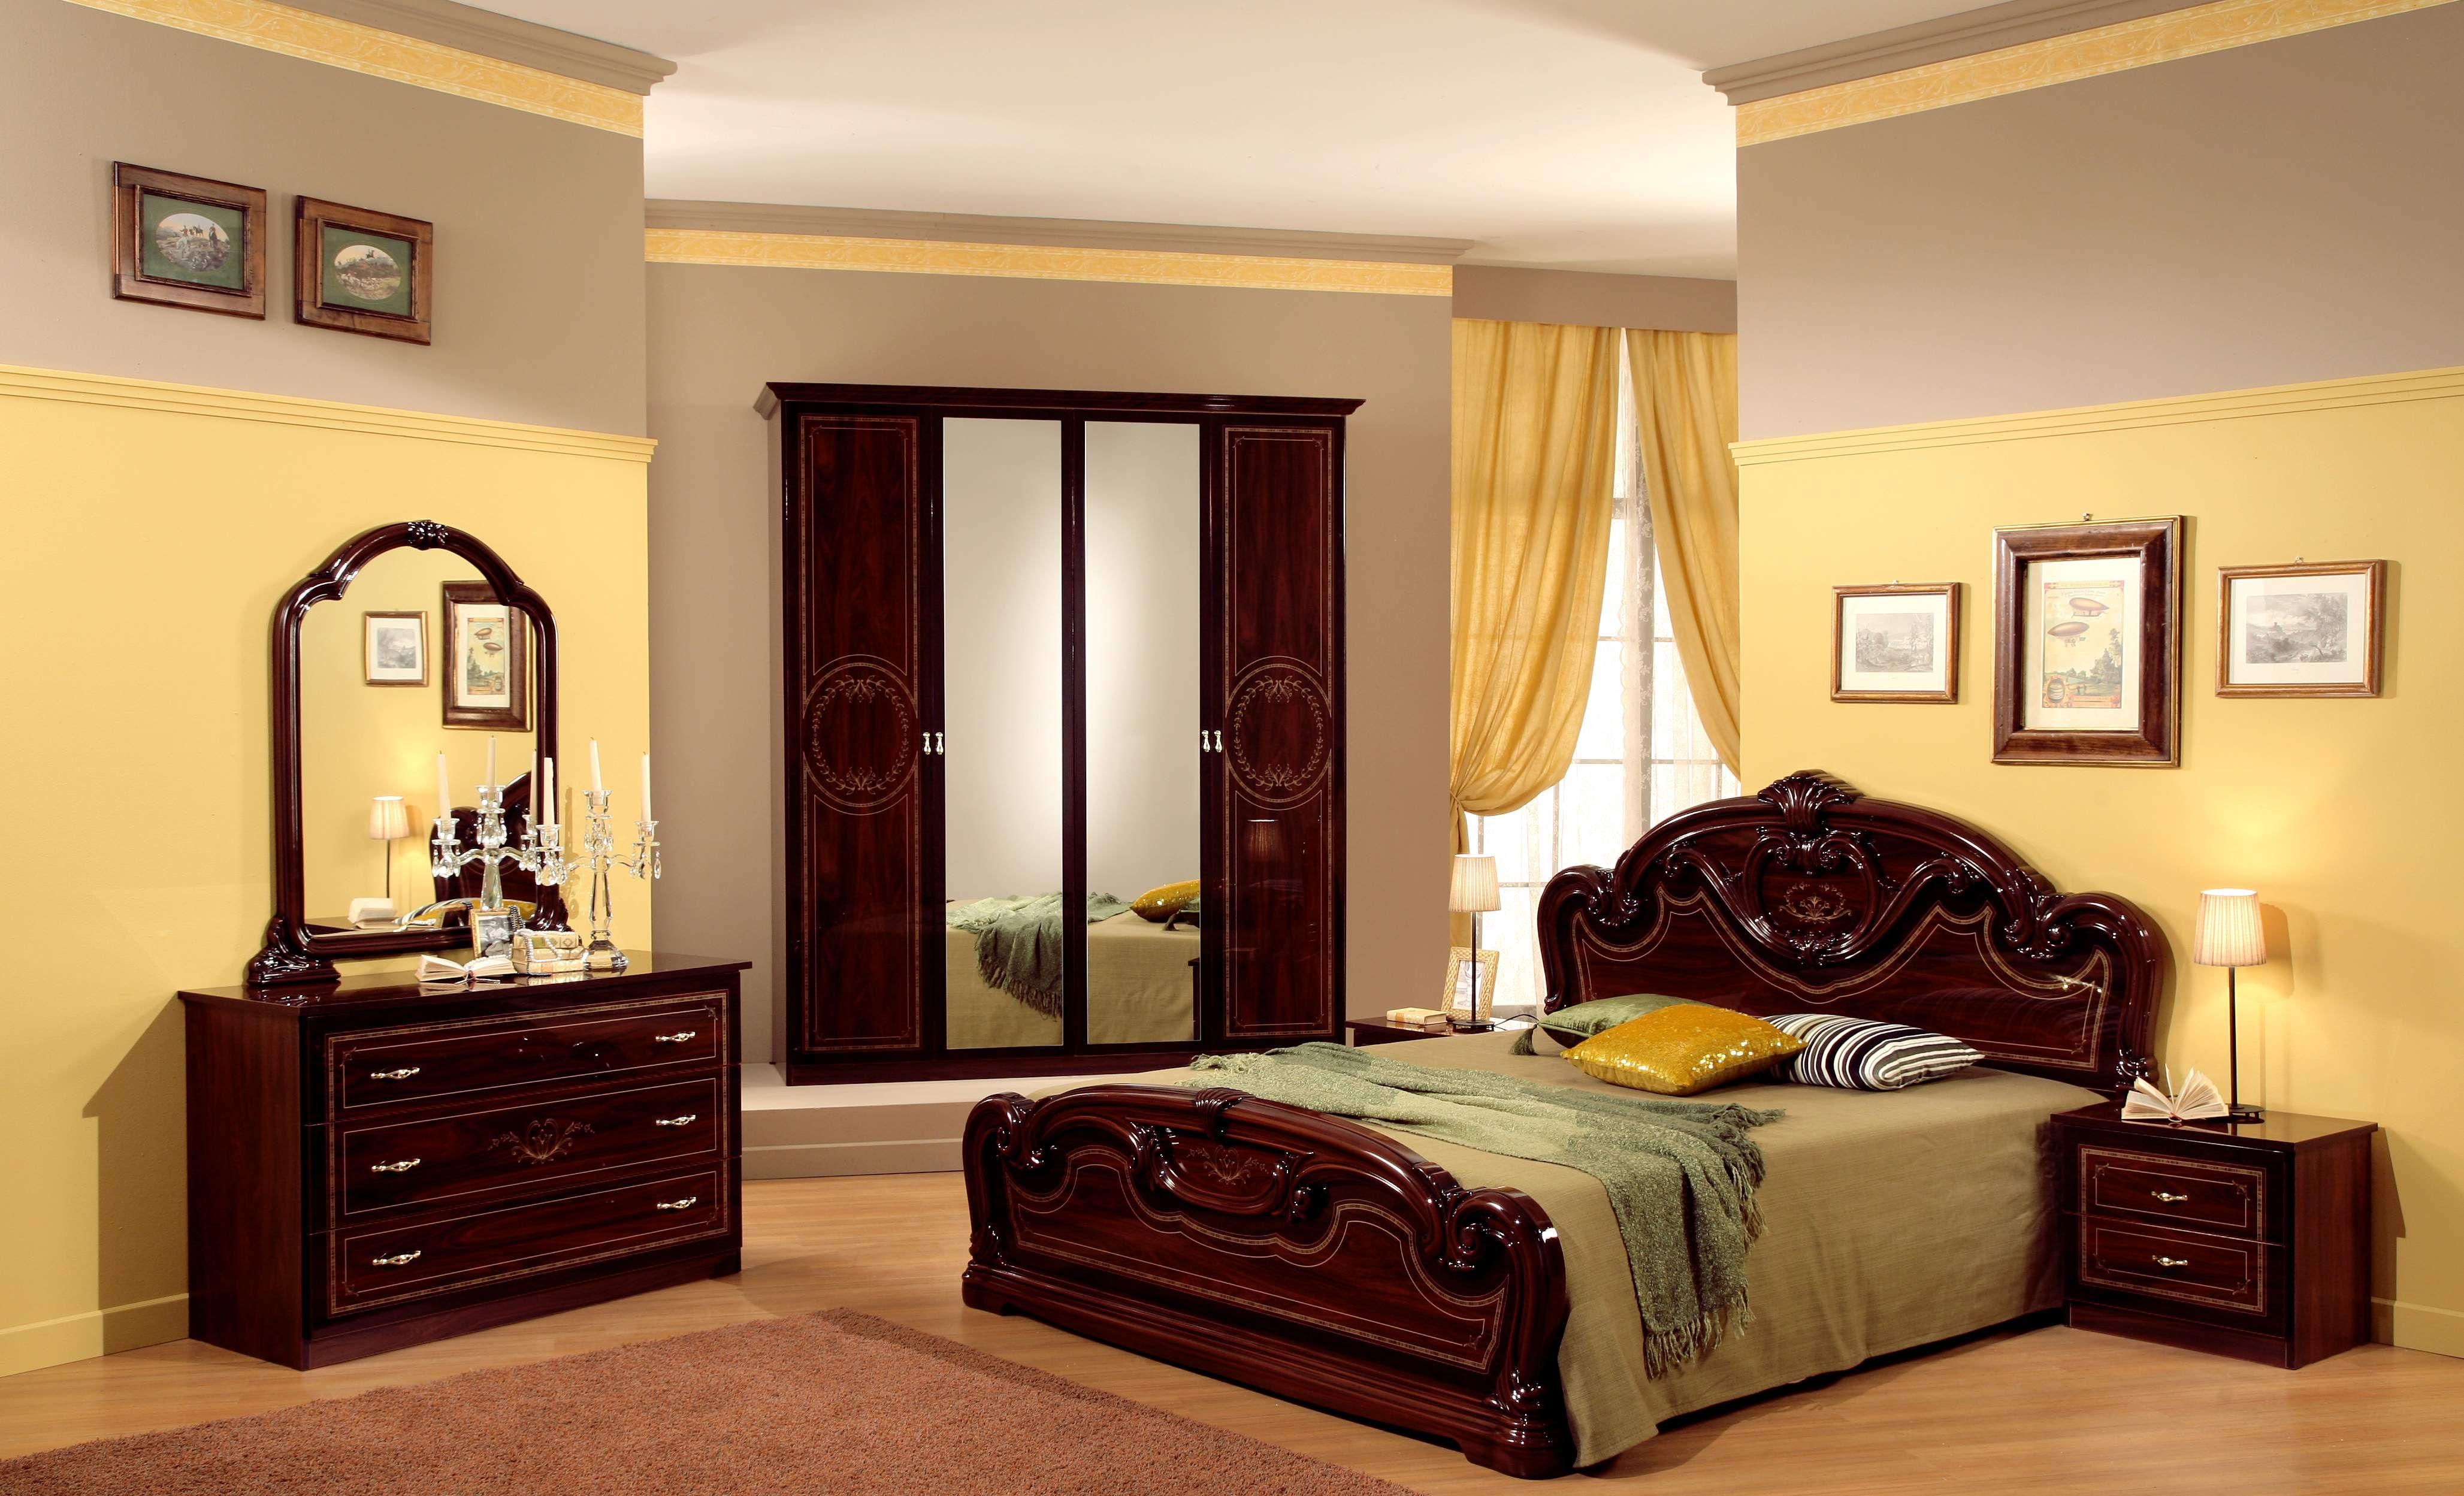 classic bedroom design decor furniture ideas cream yellow color ...